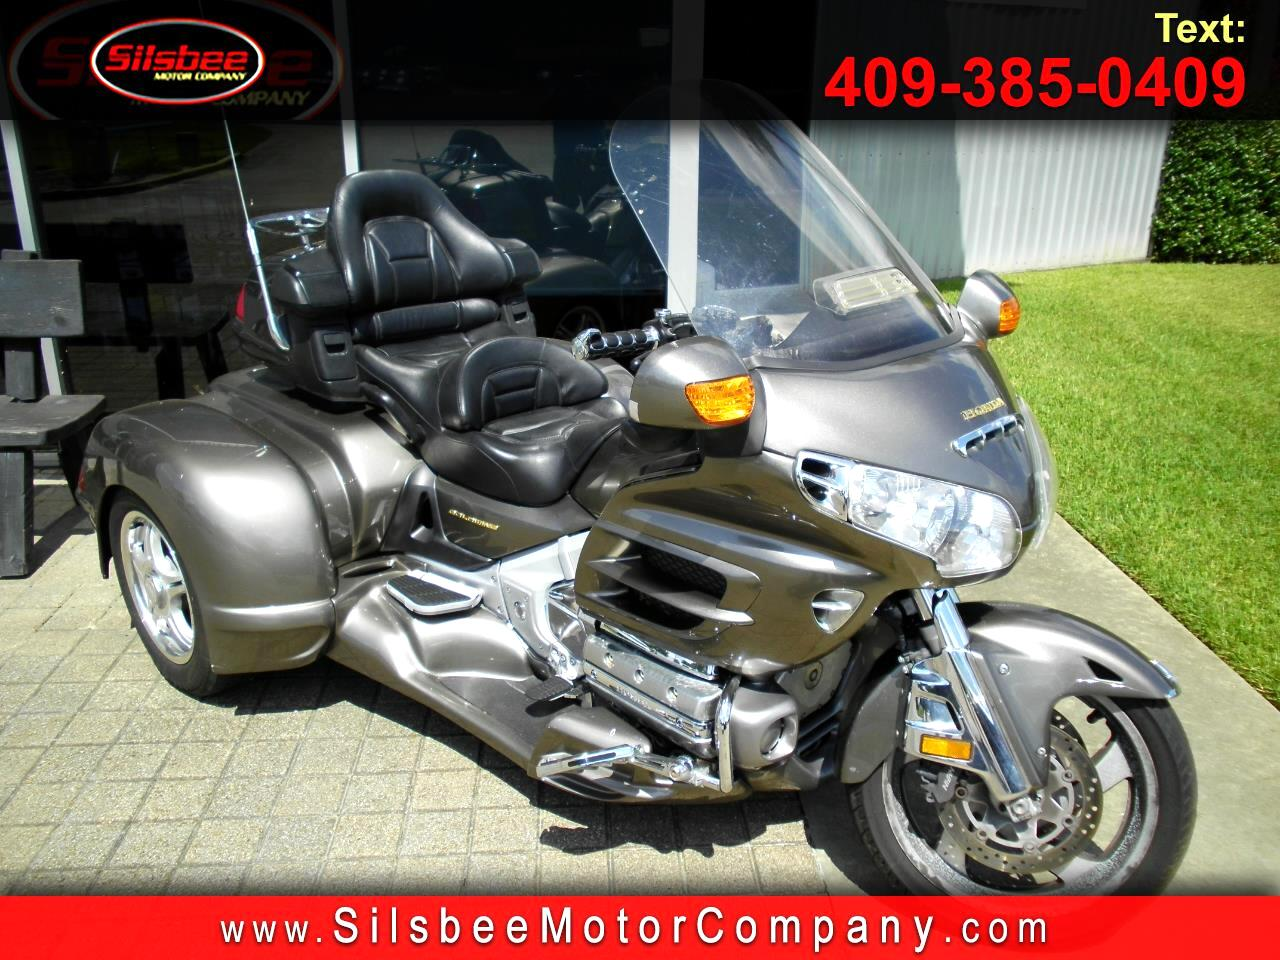 2004 Honda GL1800 Hannigan Trike